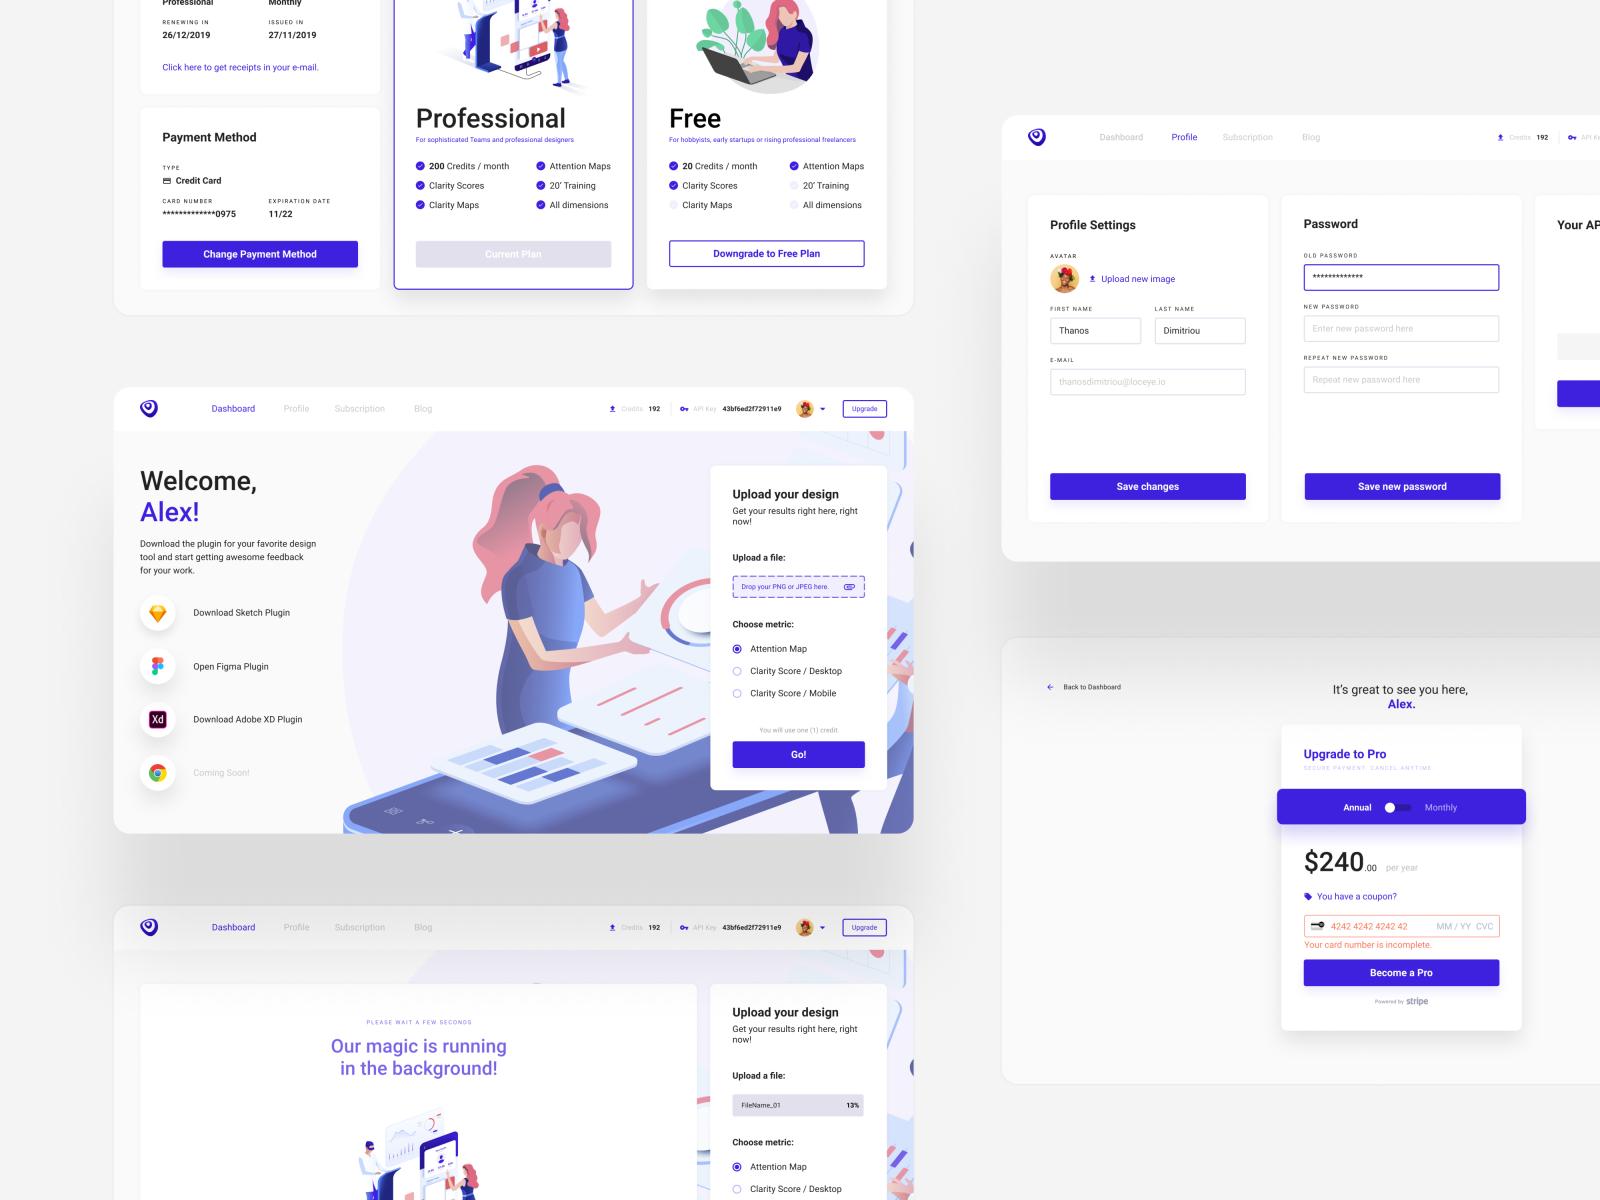 Dashboard Design - VisualEyes